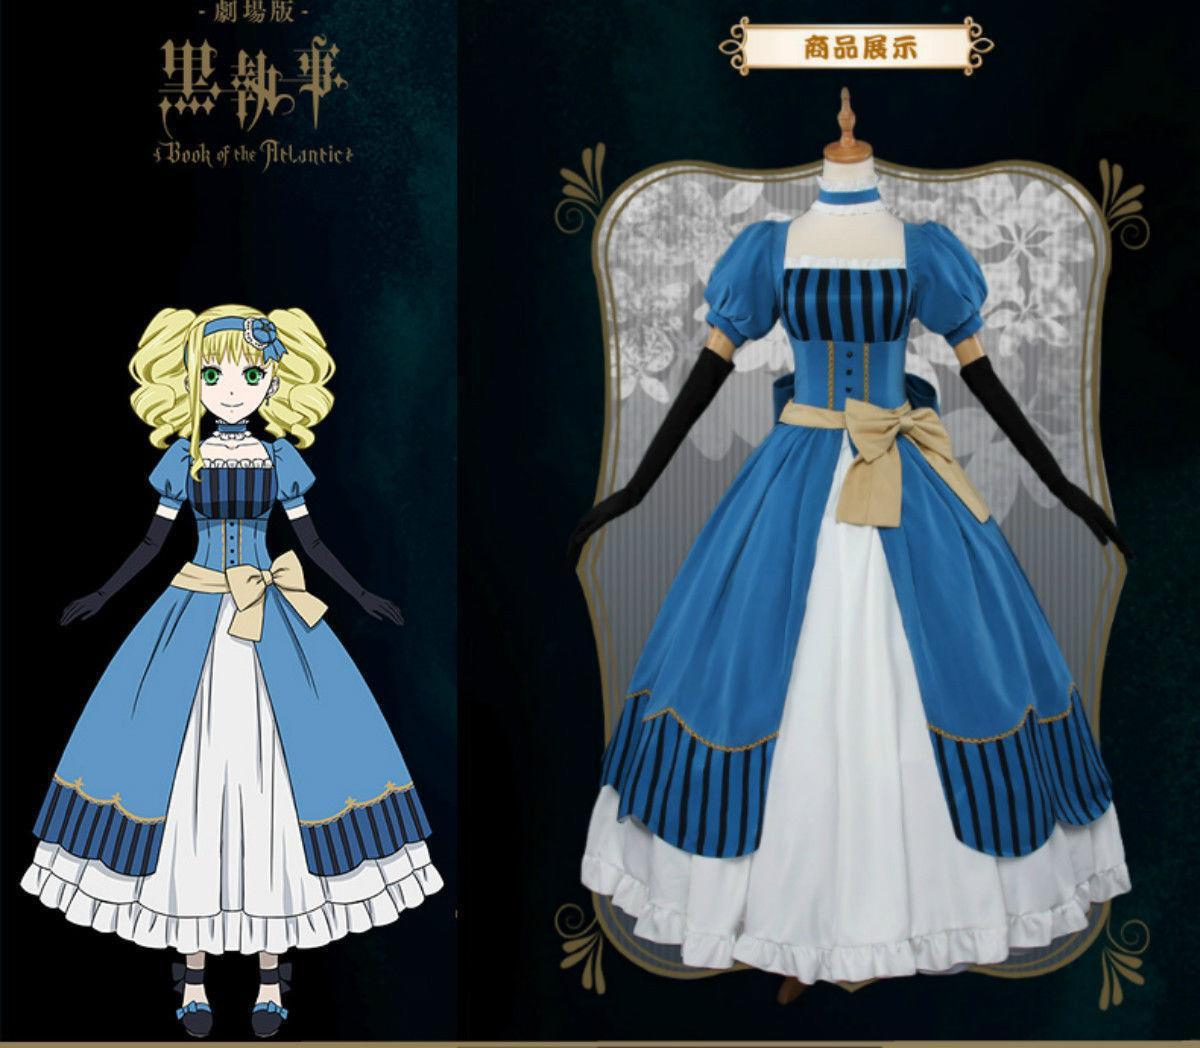 Black Butler Kuroshitsuji Elizabeth Midford(Lizzy)Party Luxury Dress Cosplay